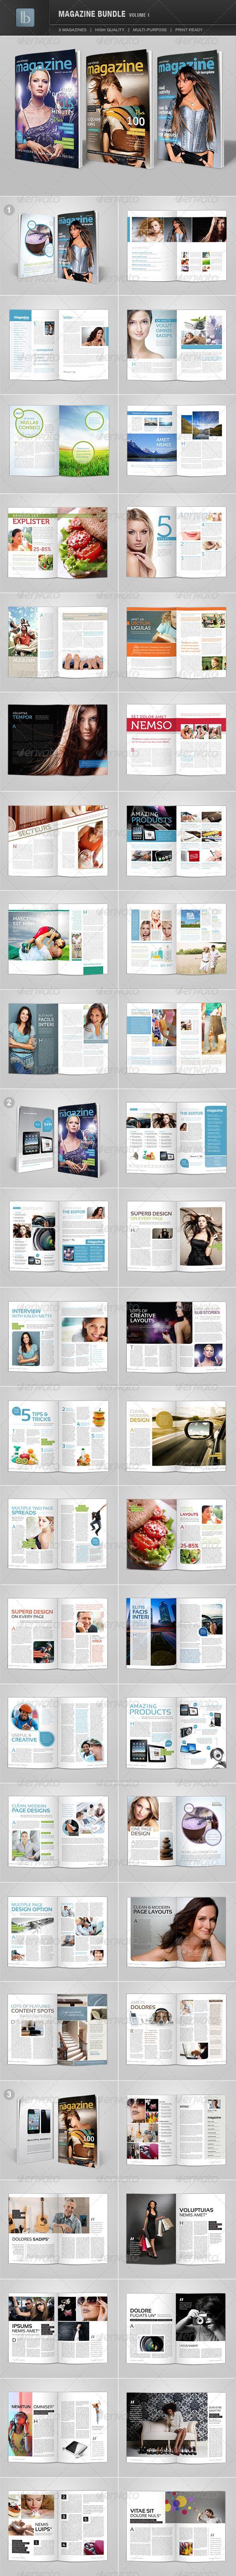 Magazine Bundle Template #design  Download: http://graphicriver.net/item/magazine-bundle-volume-1/2661597?ref=ksioks